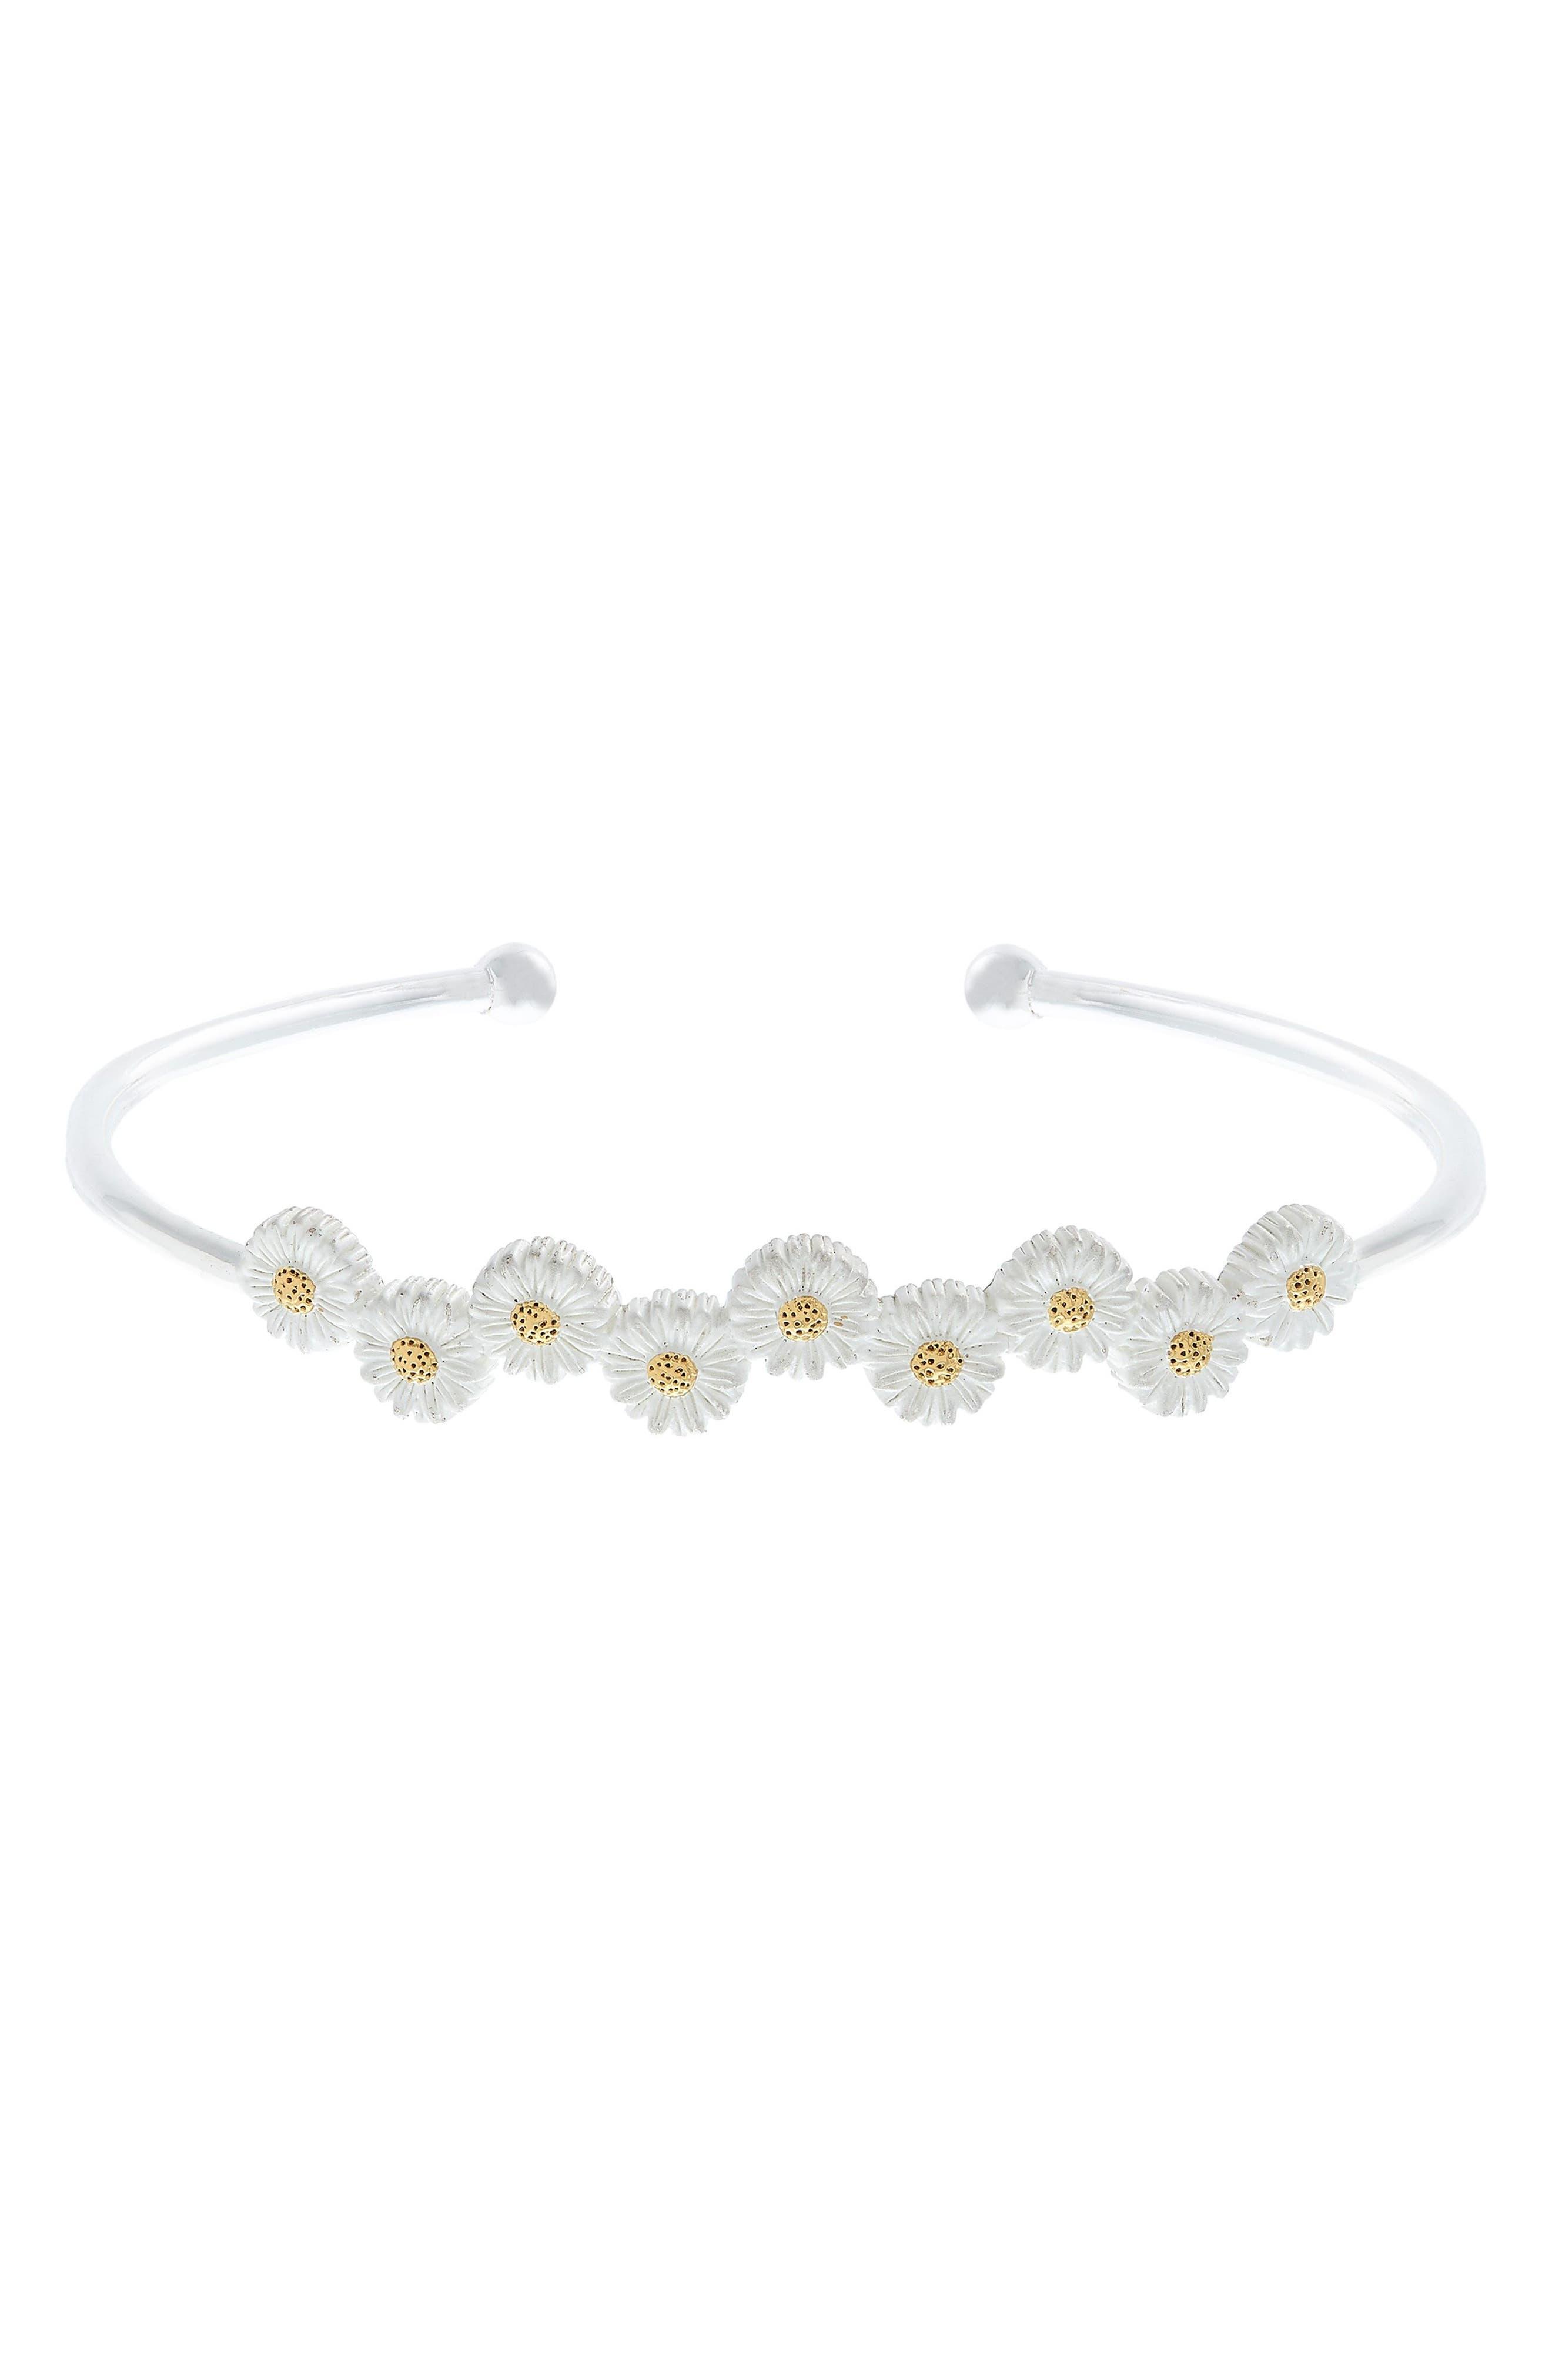 3D Daisy Open Bangle Bracelet,                         Main,                         color, Two Tone- Silver / Gold